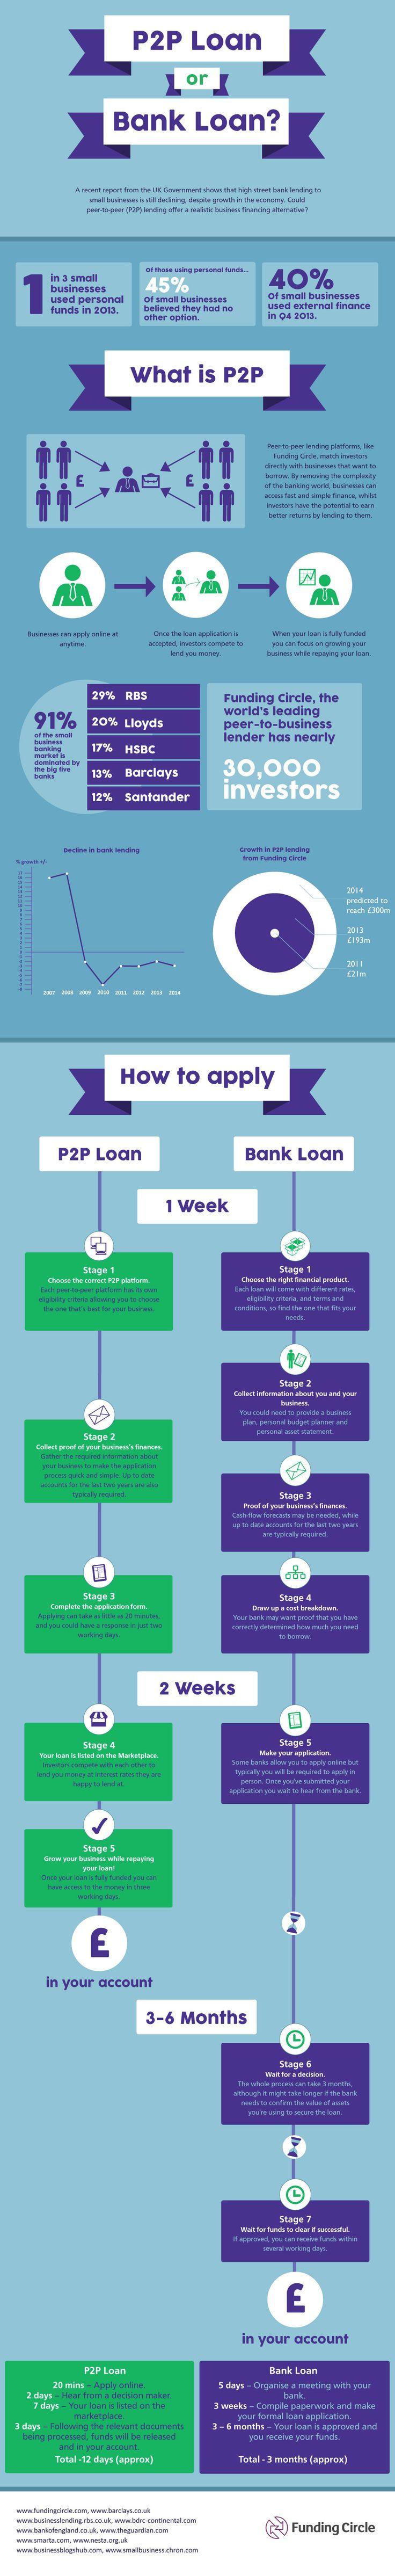 Small Business Funding Peer to Peer Lending or Bank Lending?